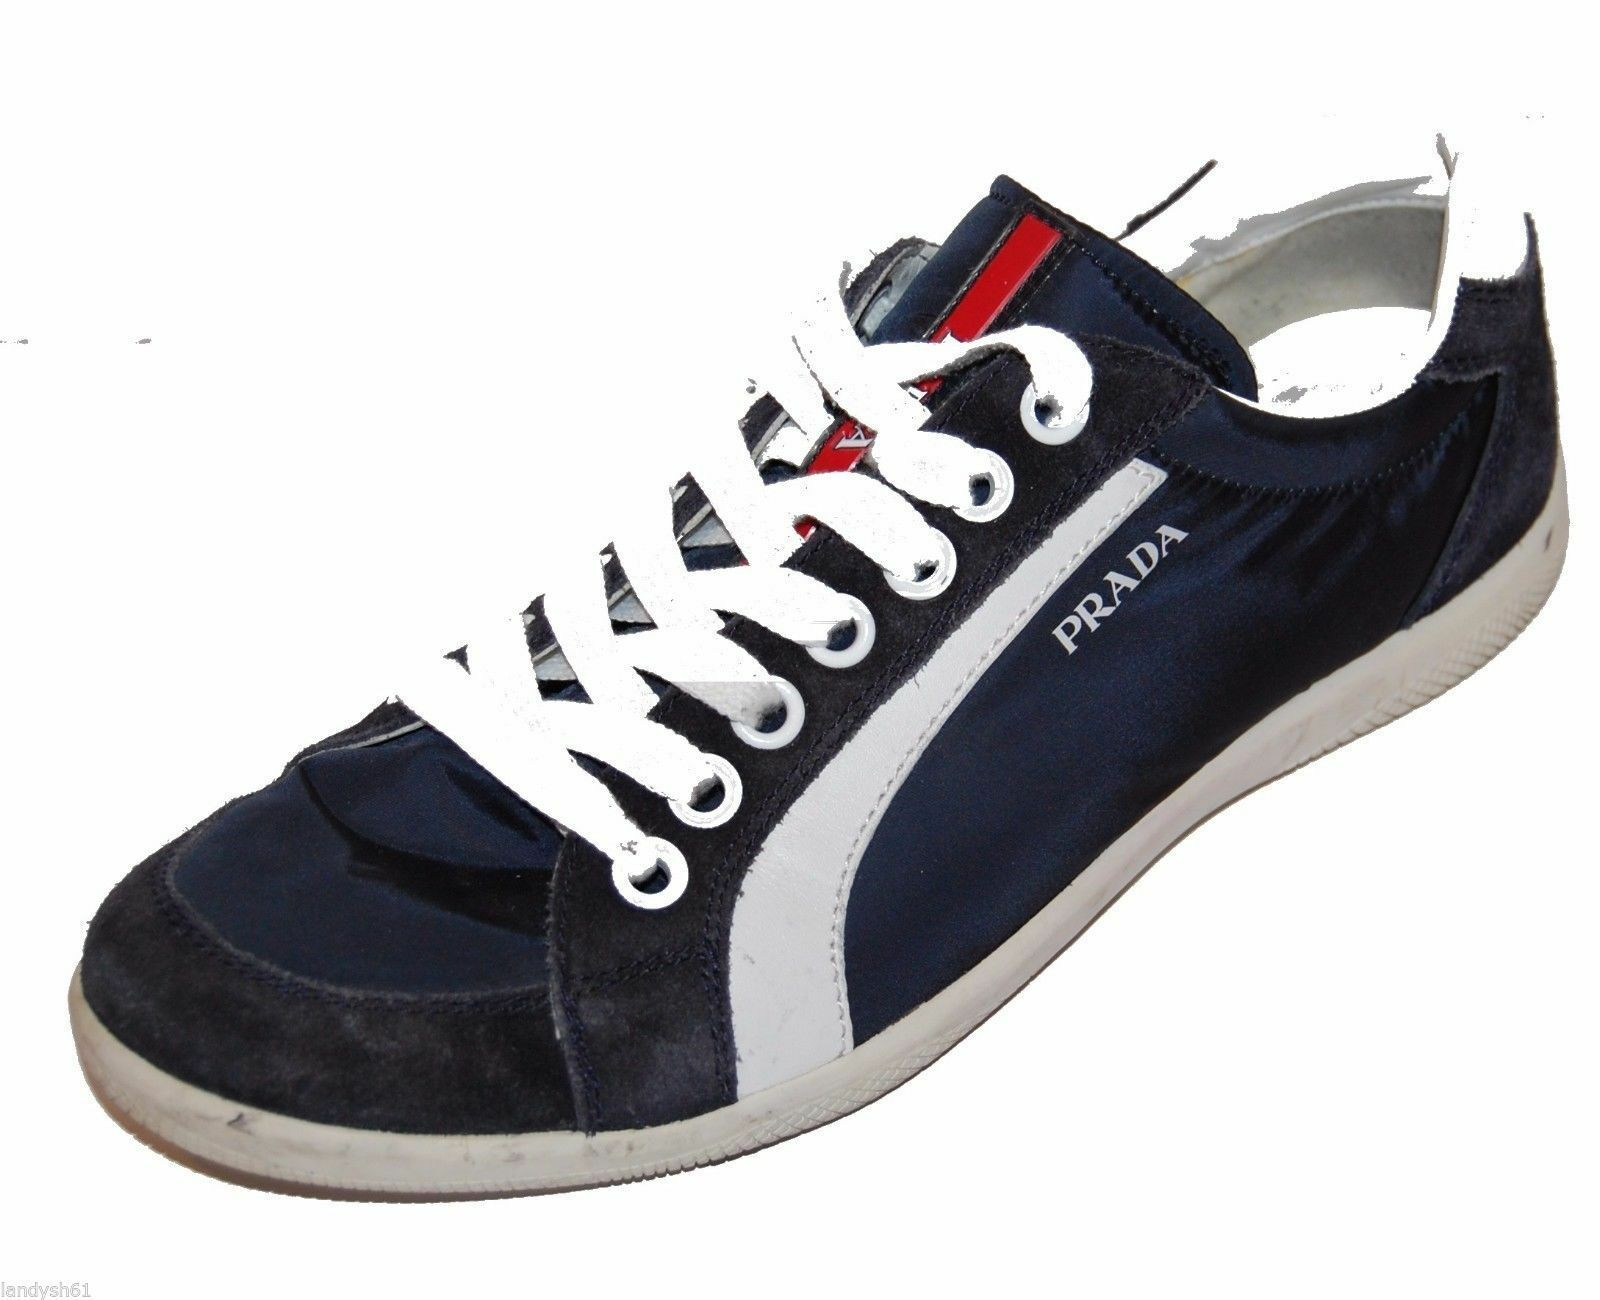 Prada Authentic Navy White Leather Men's Shoes Sneakers Sz Prada 7.5 US 8.5